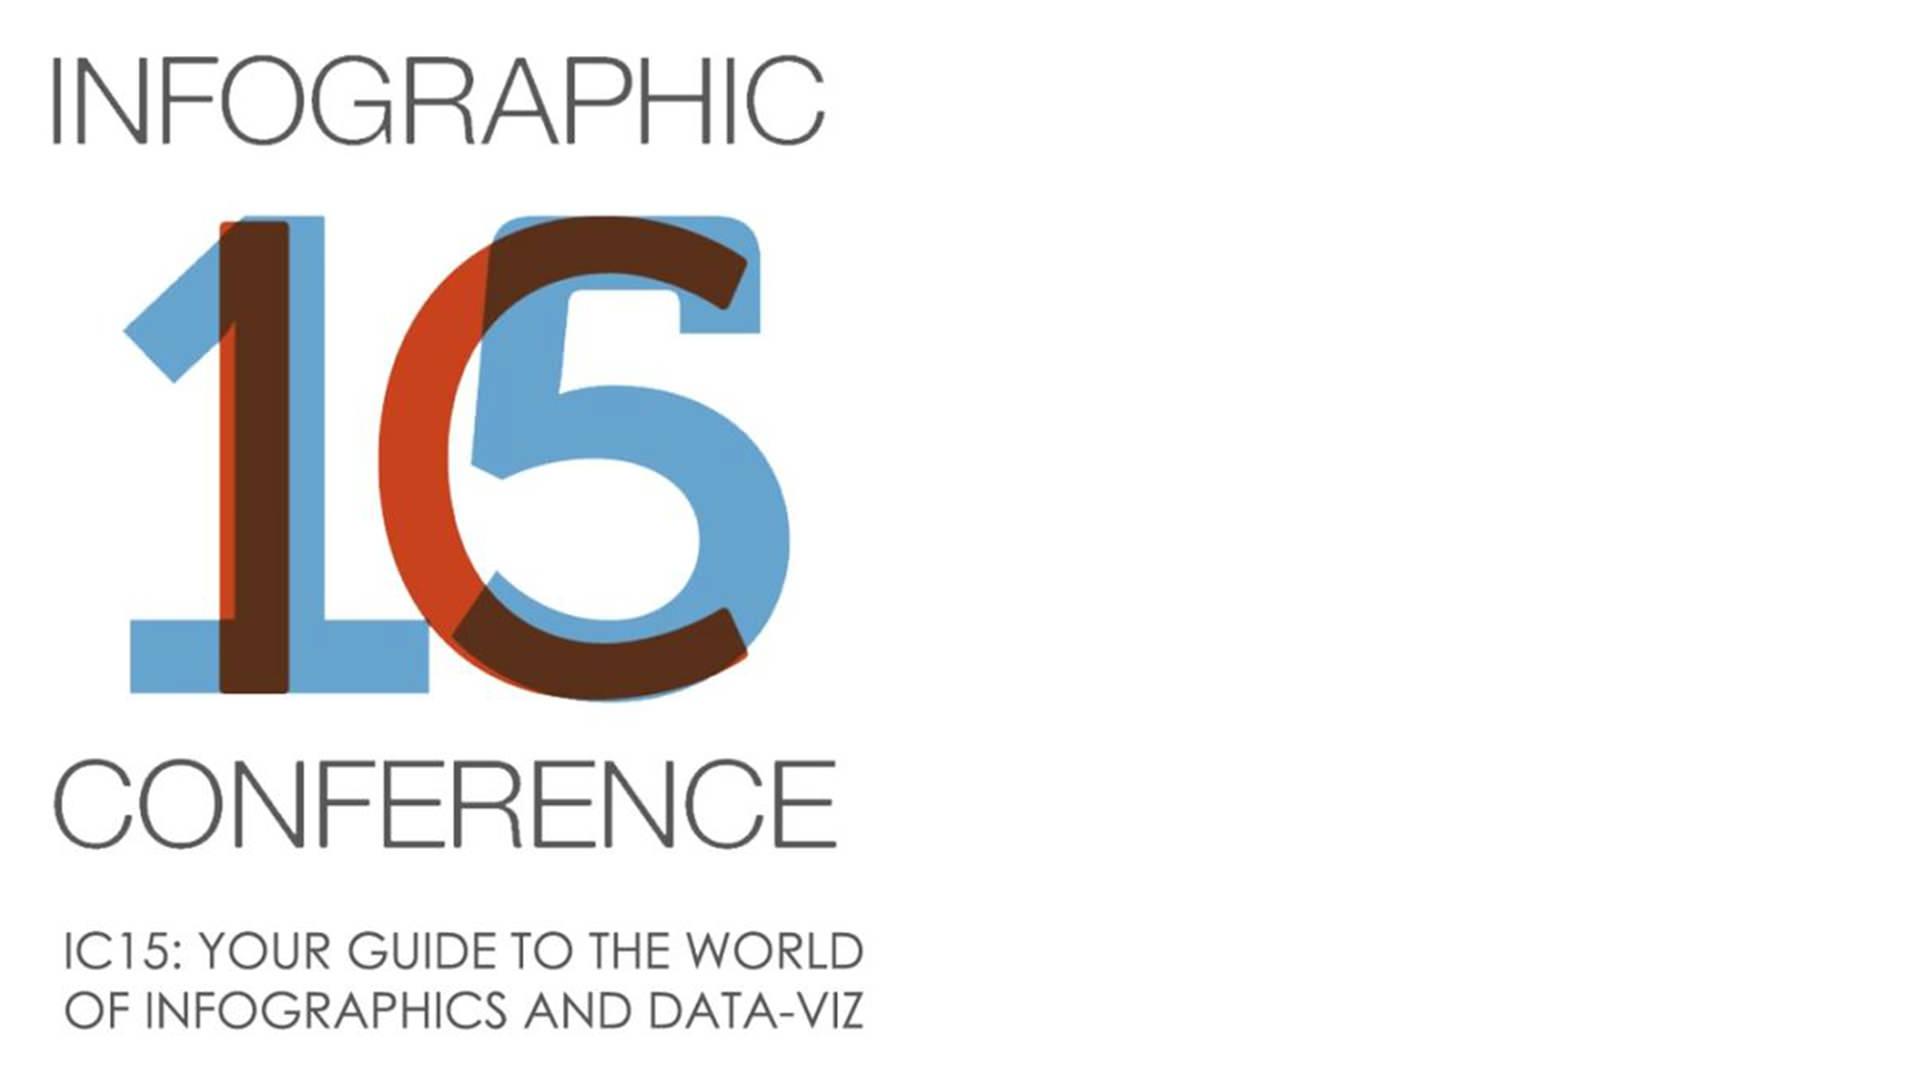 Infographic congres 2015 shot animatie